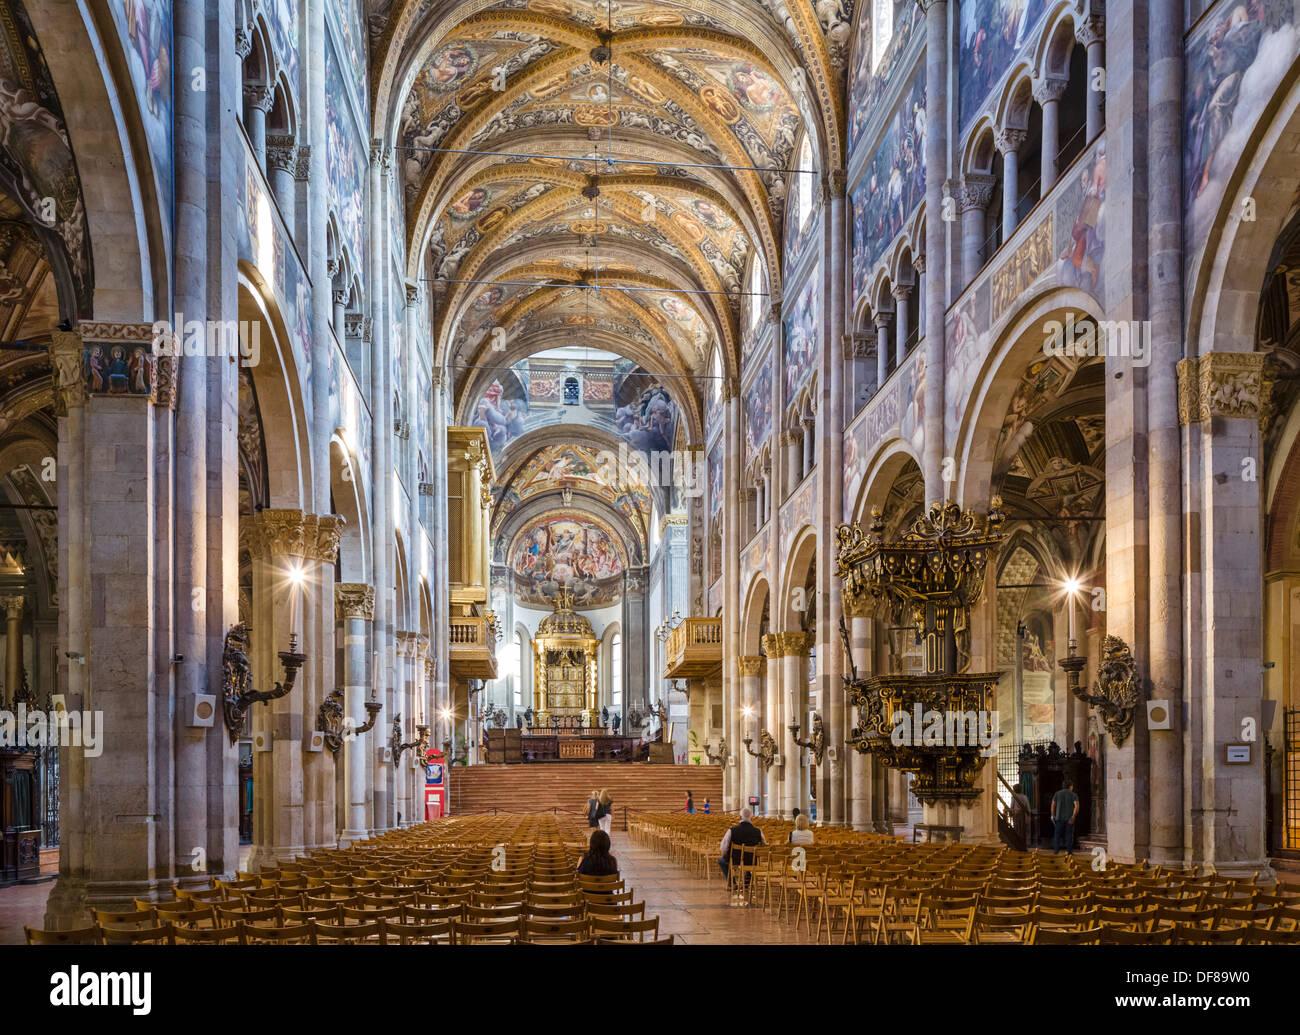 Interior de la catedral (Duomo), Parma, Emilia Romagna, Italia Imagen De Stock